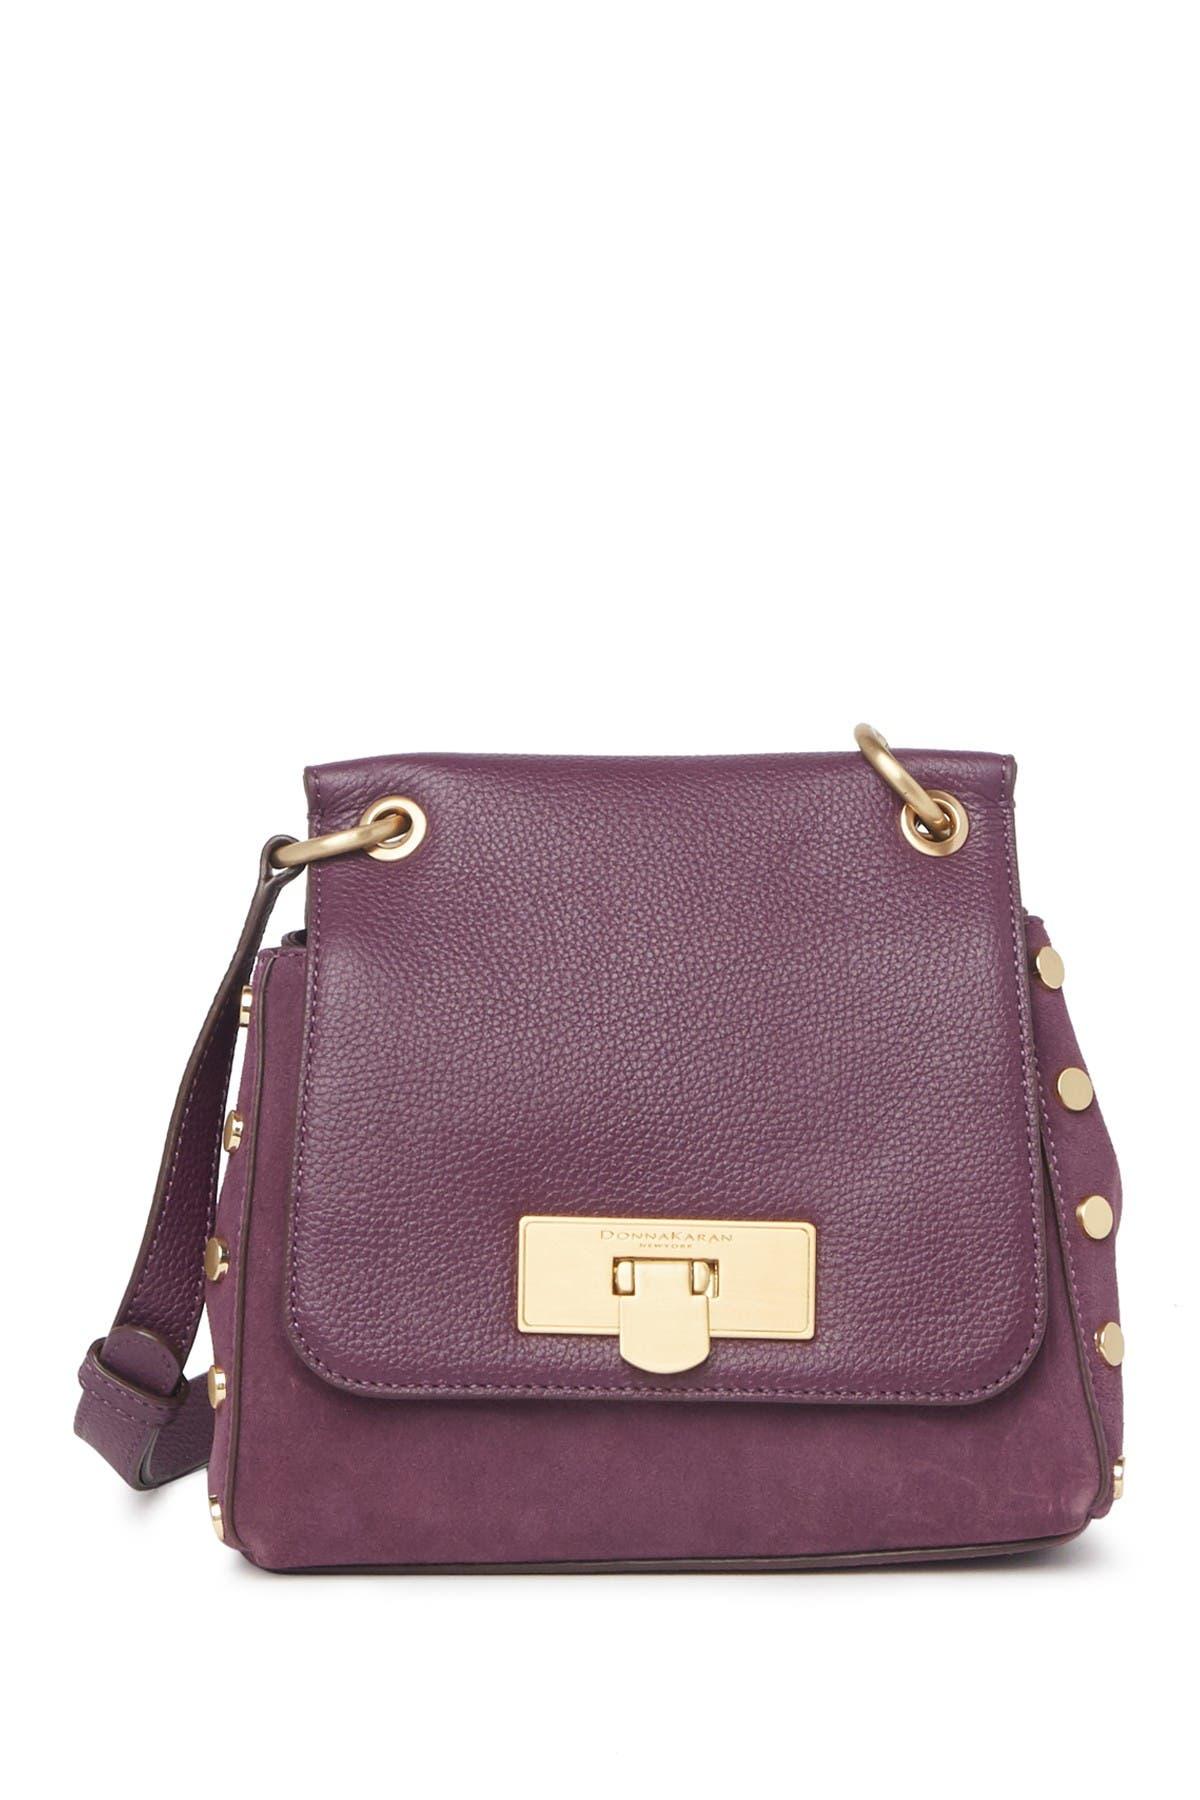 Image of Donna Karan Bayle Leather Crossbody Bag